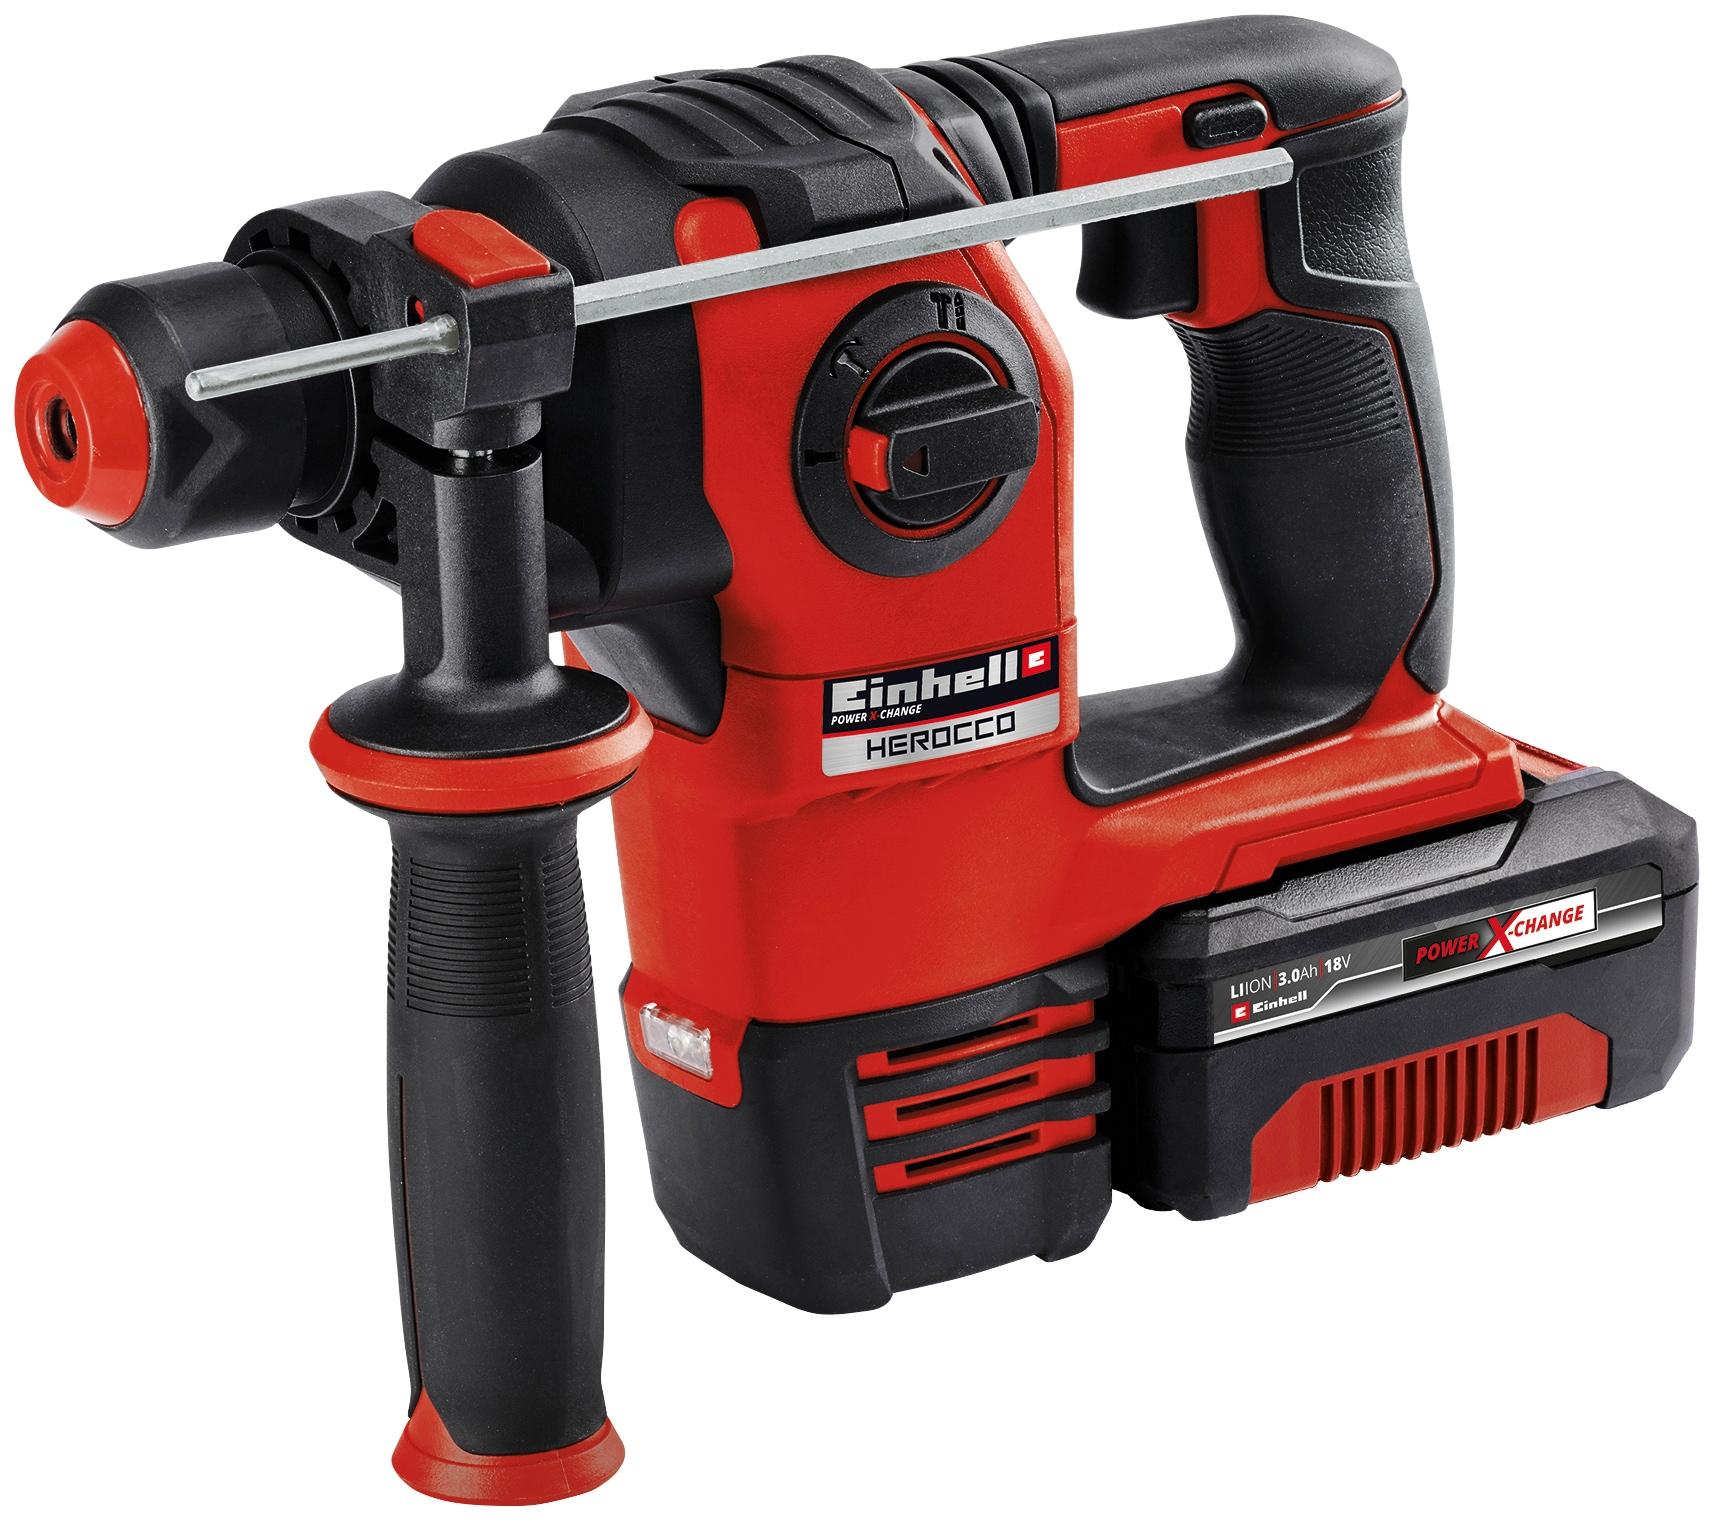 Einhell Akku-Bohrhammer HEROCCO Kit +5 (1x3,0Ah), (5 tlg.) rot Bohrmaschinen Werkzeug Maschinen